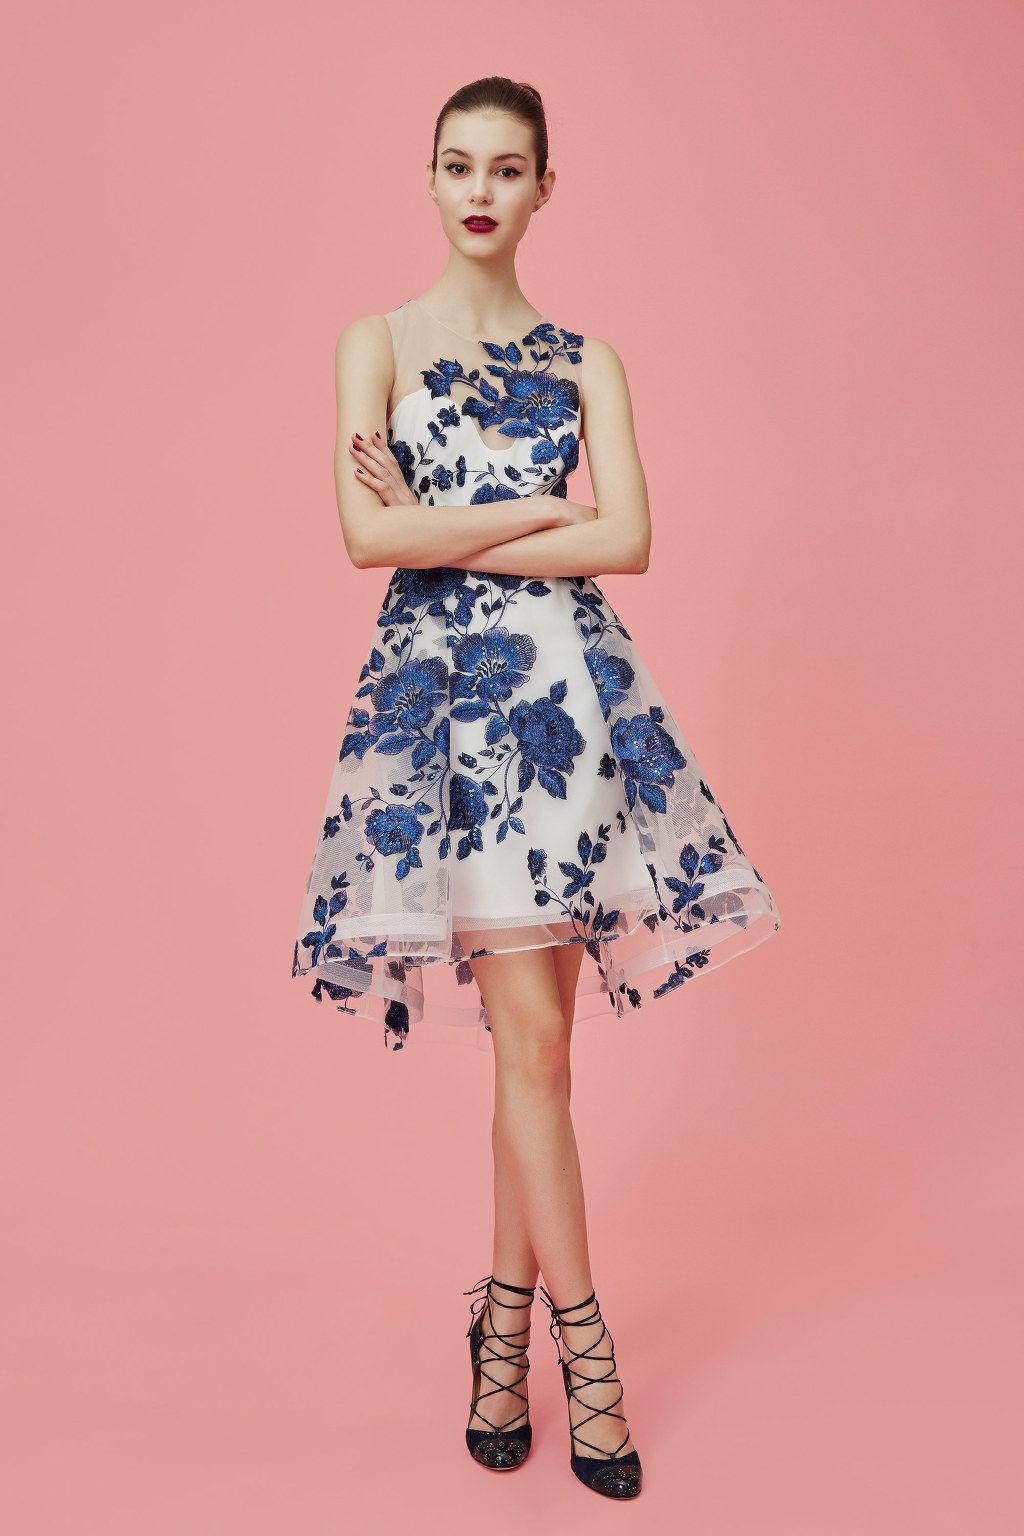 Pin de 진유 en 옷 | Pinterest | Vestiditos